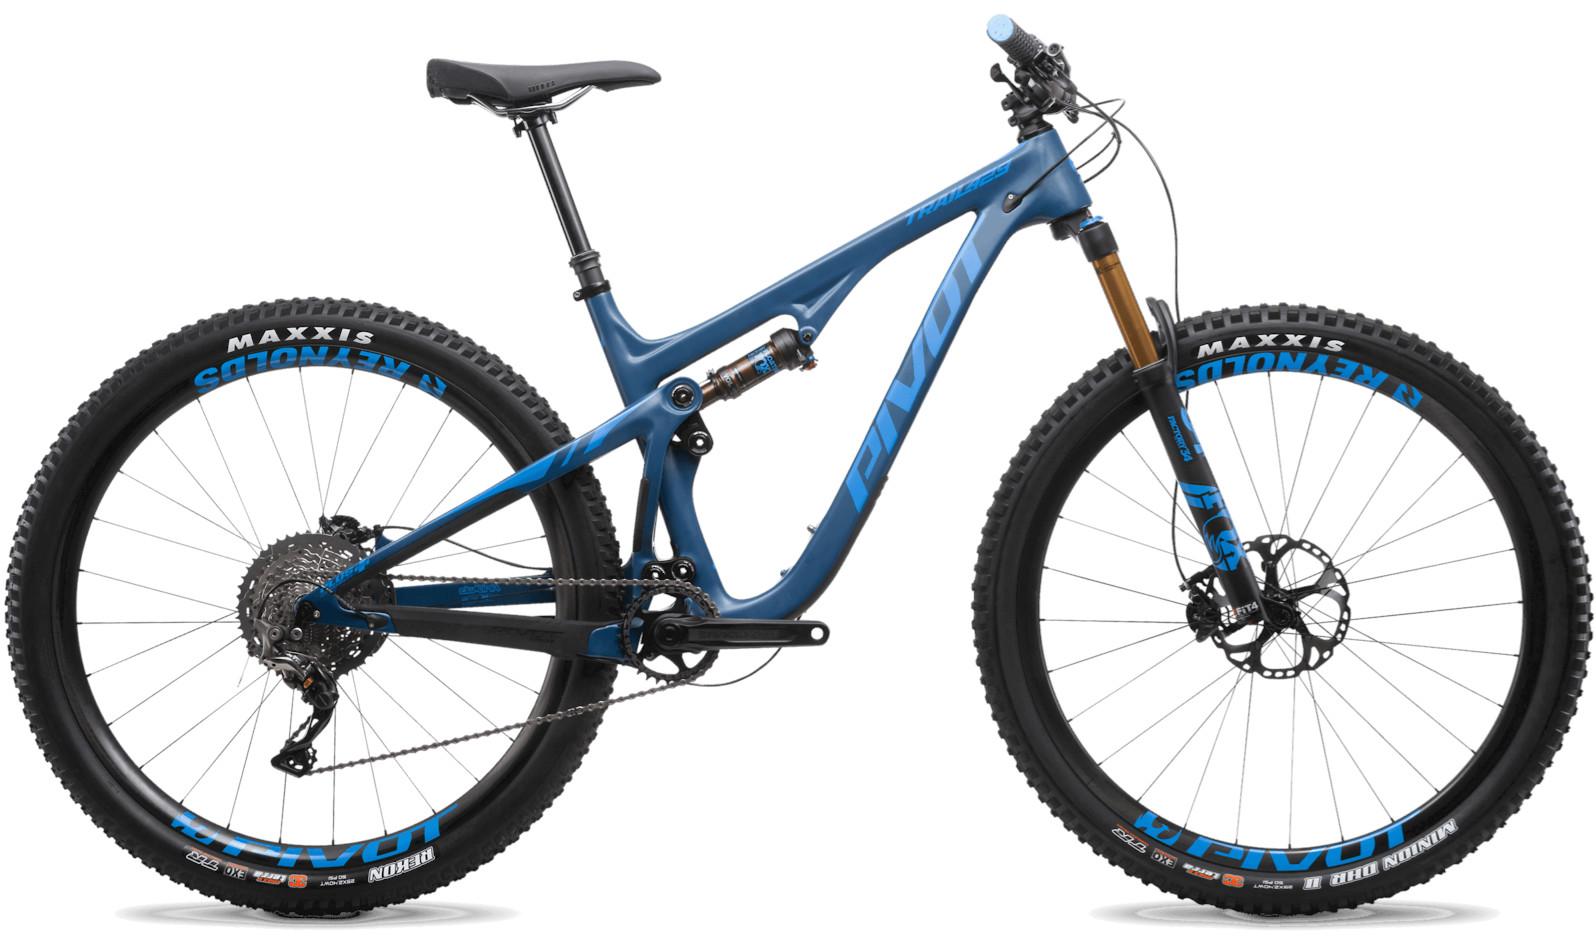 2020 Pivot Trail 429 Steel Blue (29 Team XTR build pictured)